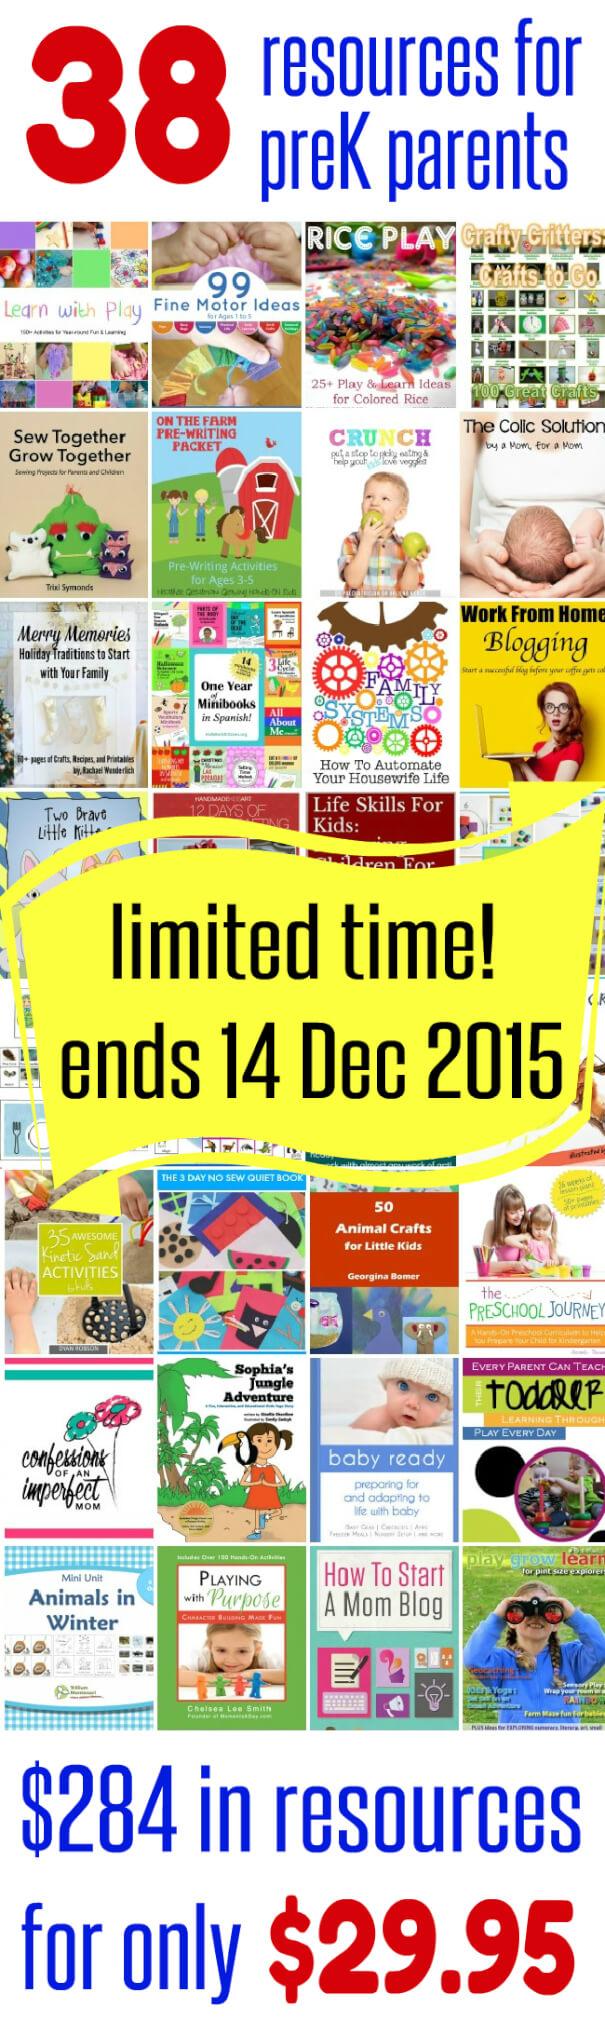 38 Resources for Preschool Parents incredible eBook bundle sale ends 14 December 2015